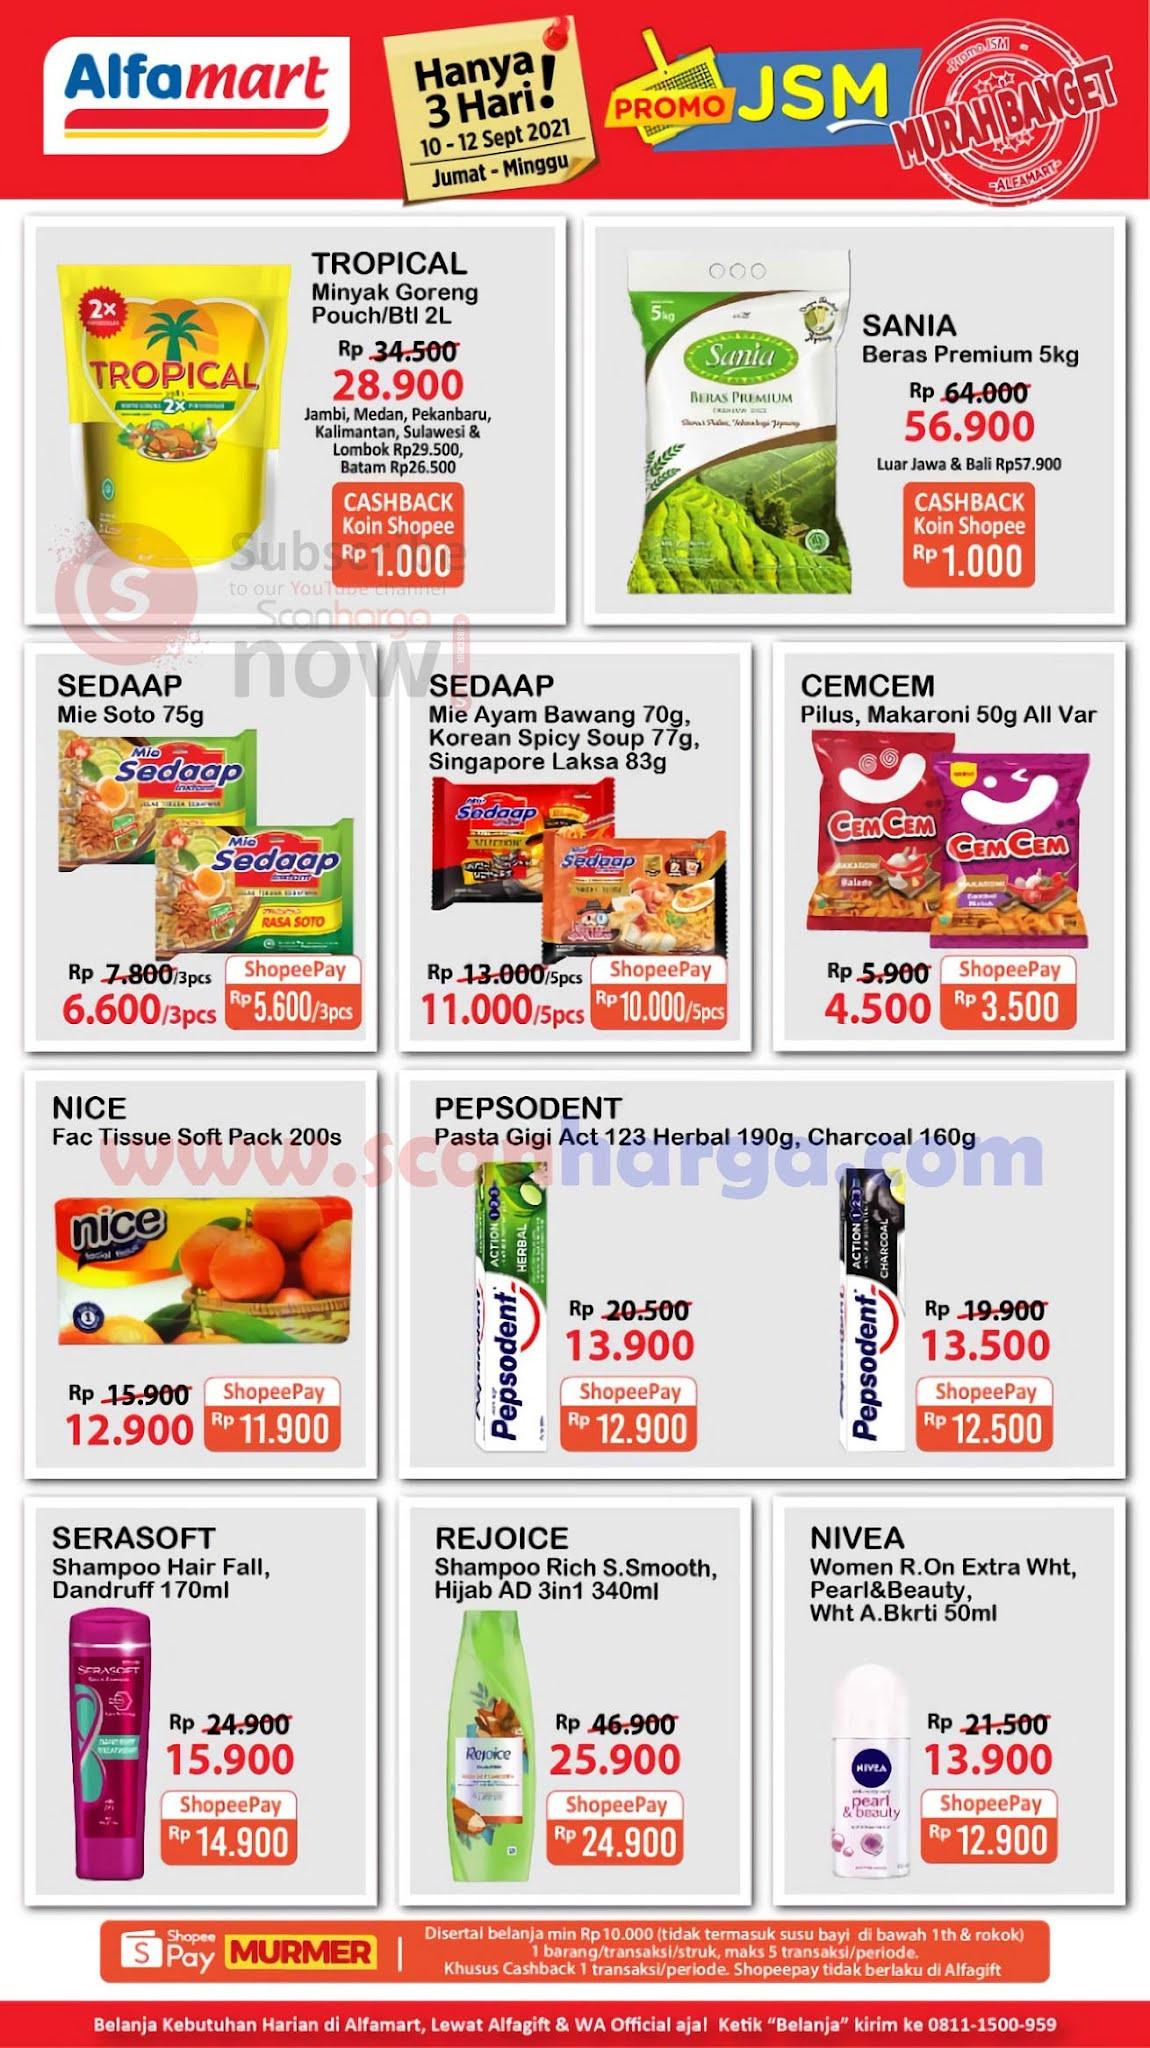 Katalog Promo JSM Alfamart Terbaru 10 - 12 September 2021